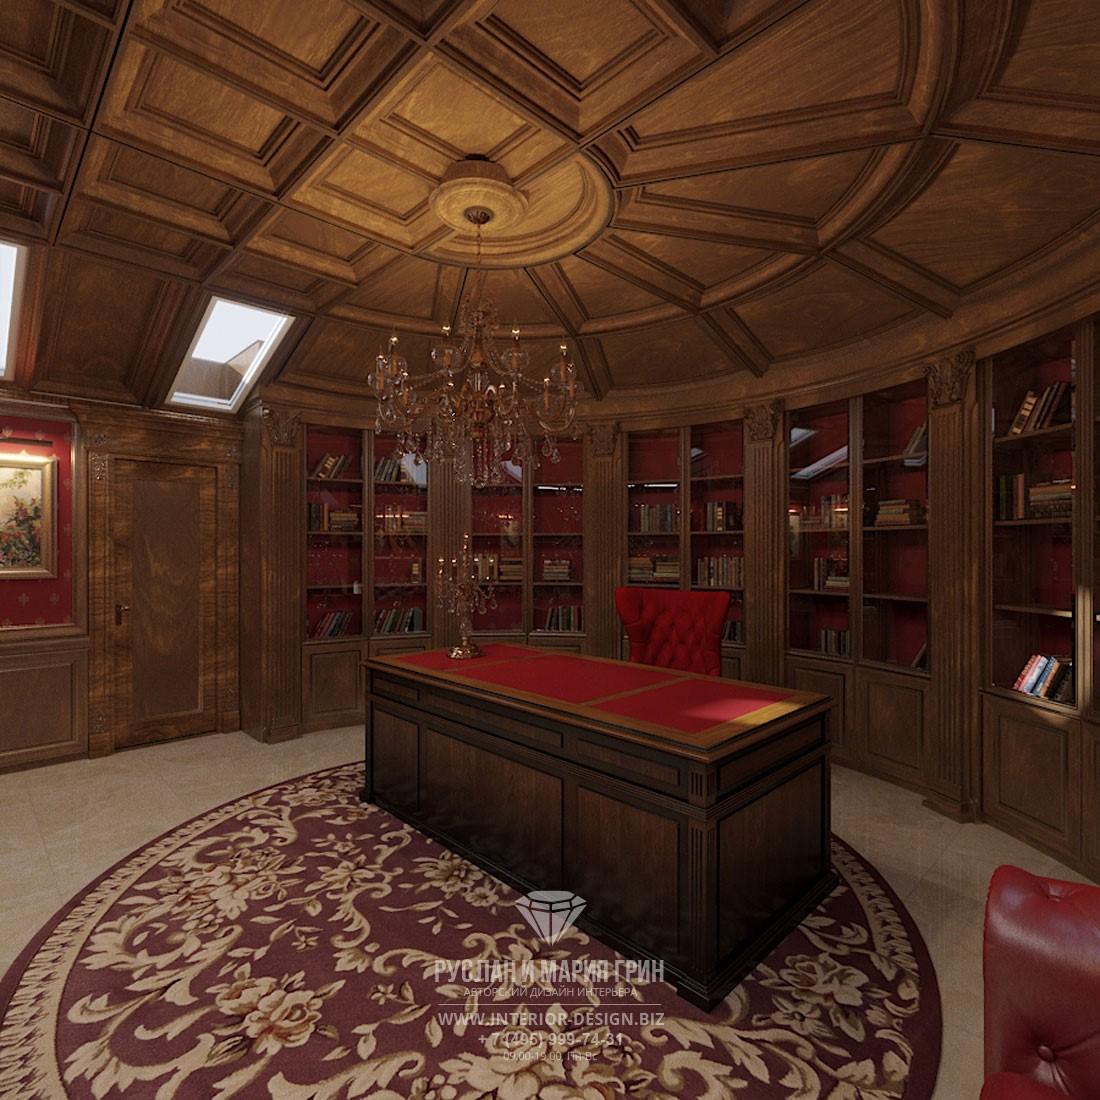 Интерьер классического кабинета с кессонами на потолке